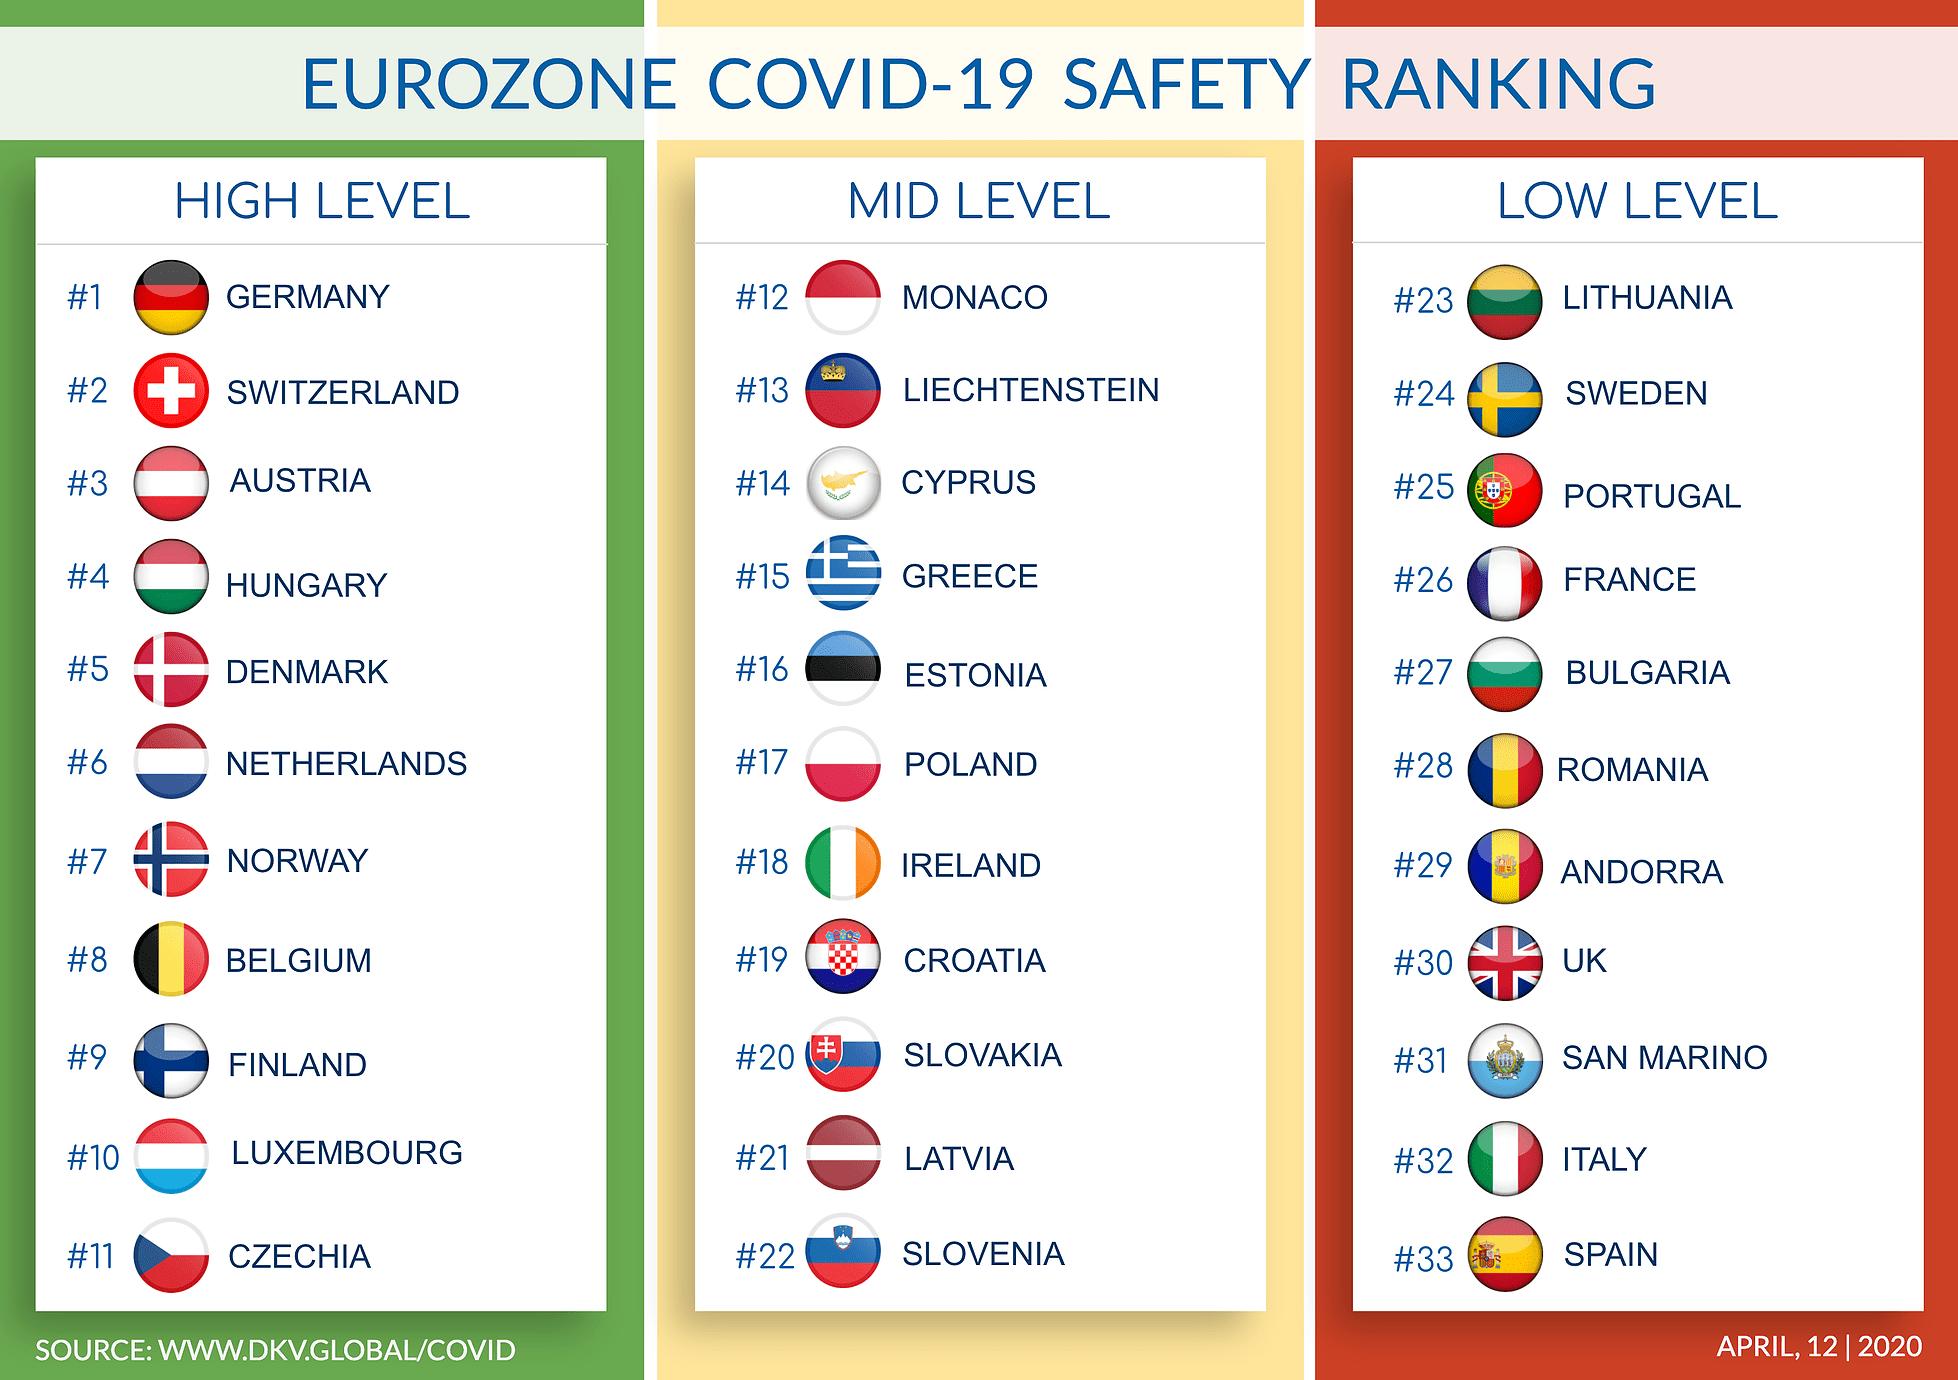 Eurozone COVID-19 ranking